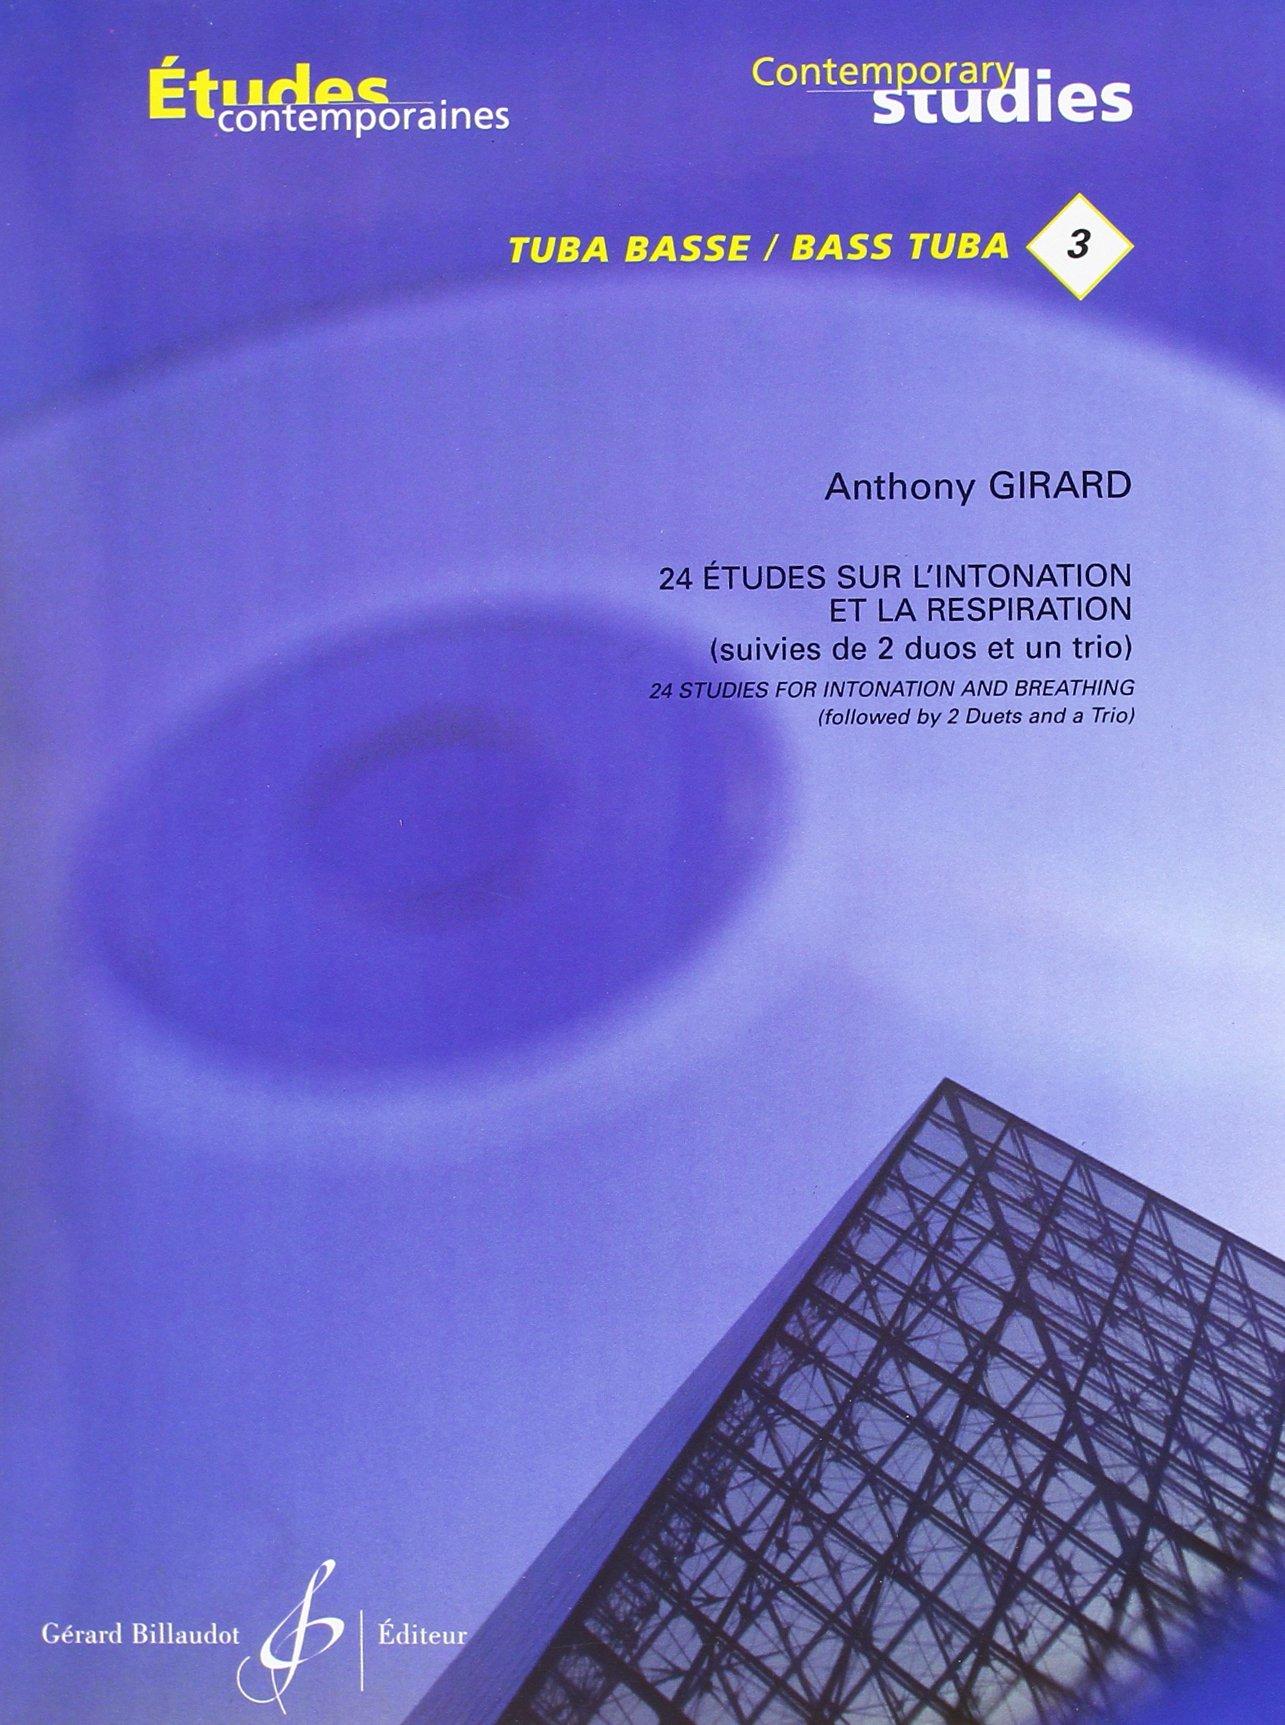 24 Etudes d'Intonation et de Respiration - Tuba Basse Taschenbuch – 30. April 2010 Girard Anthony Billaudot B003JYOSWA